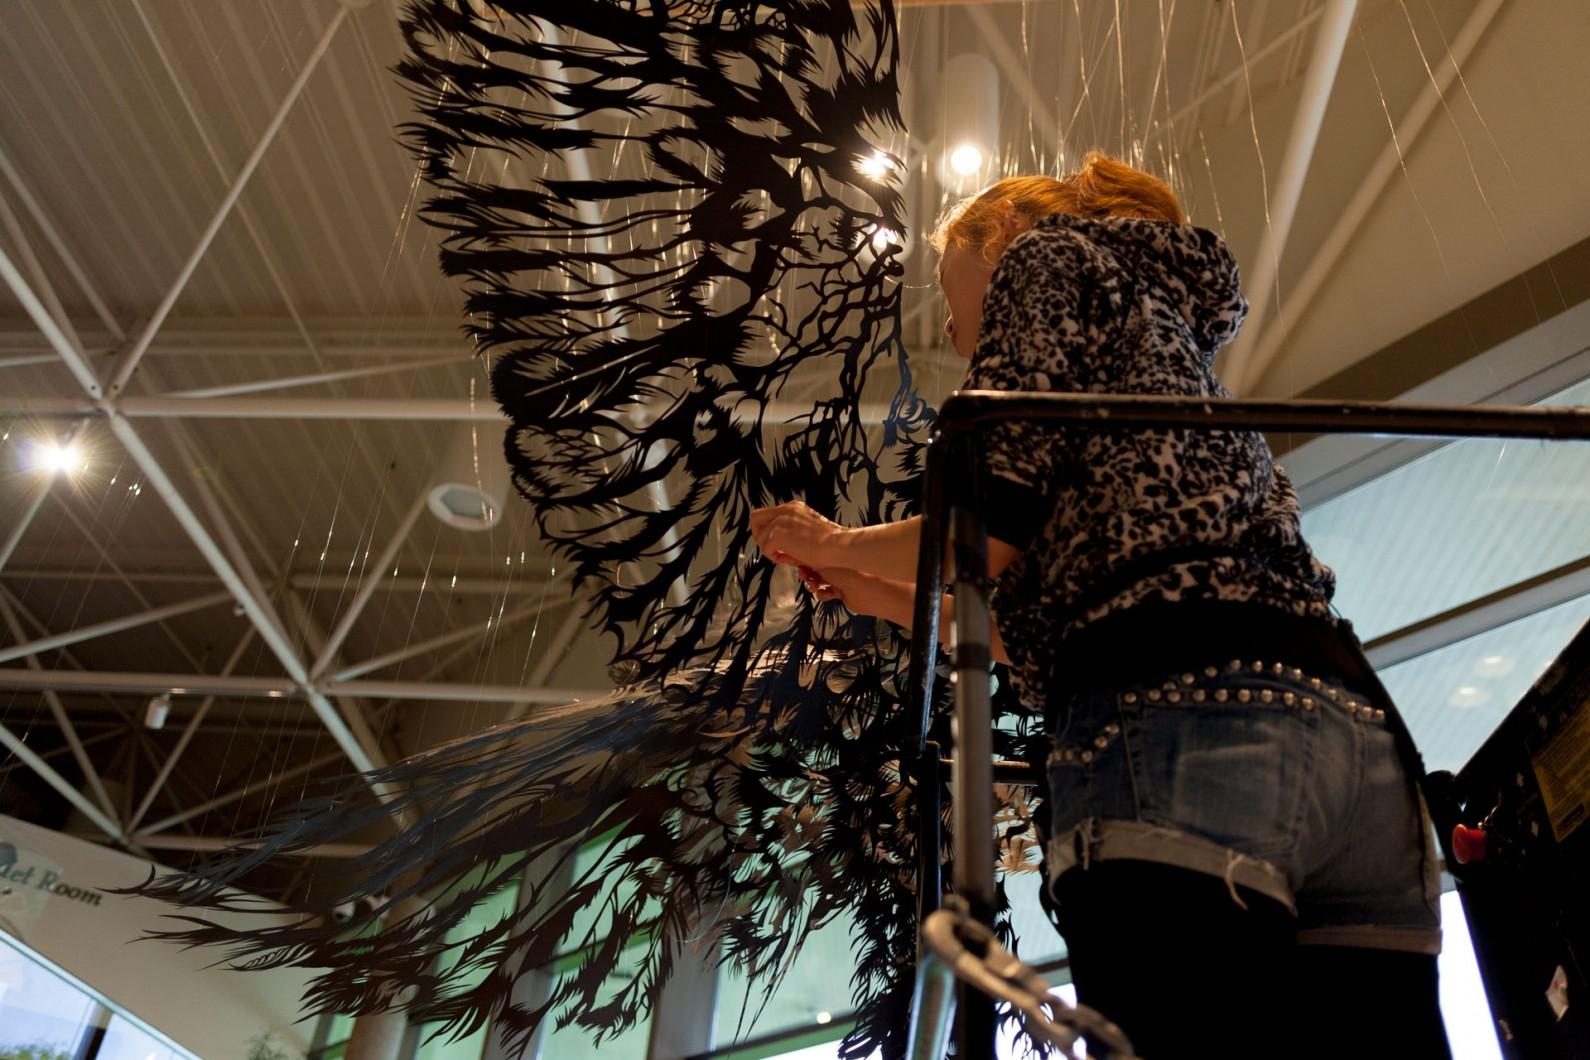 ArtPrize2014 Installation Paper Cut Sculpture Nahoko Kojima hanging Washi Bald Eagle Gerald Ford Museum ArtPrize